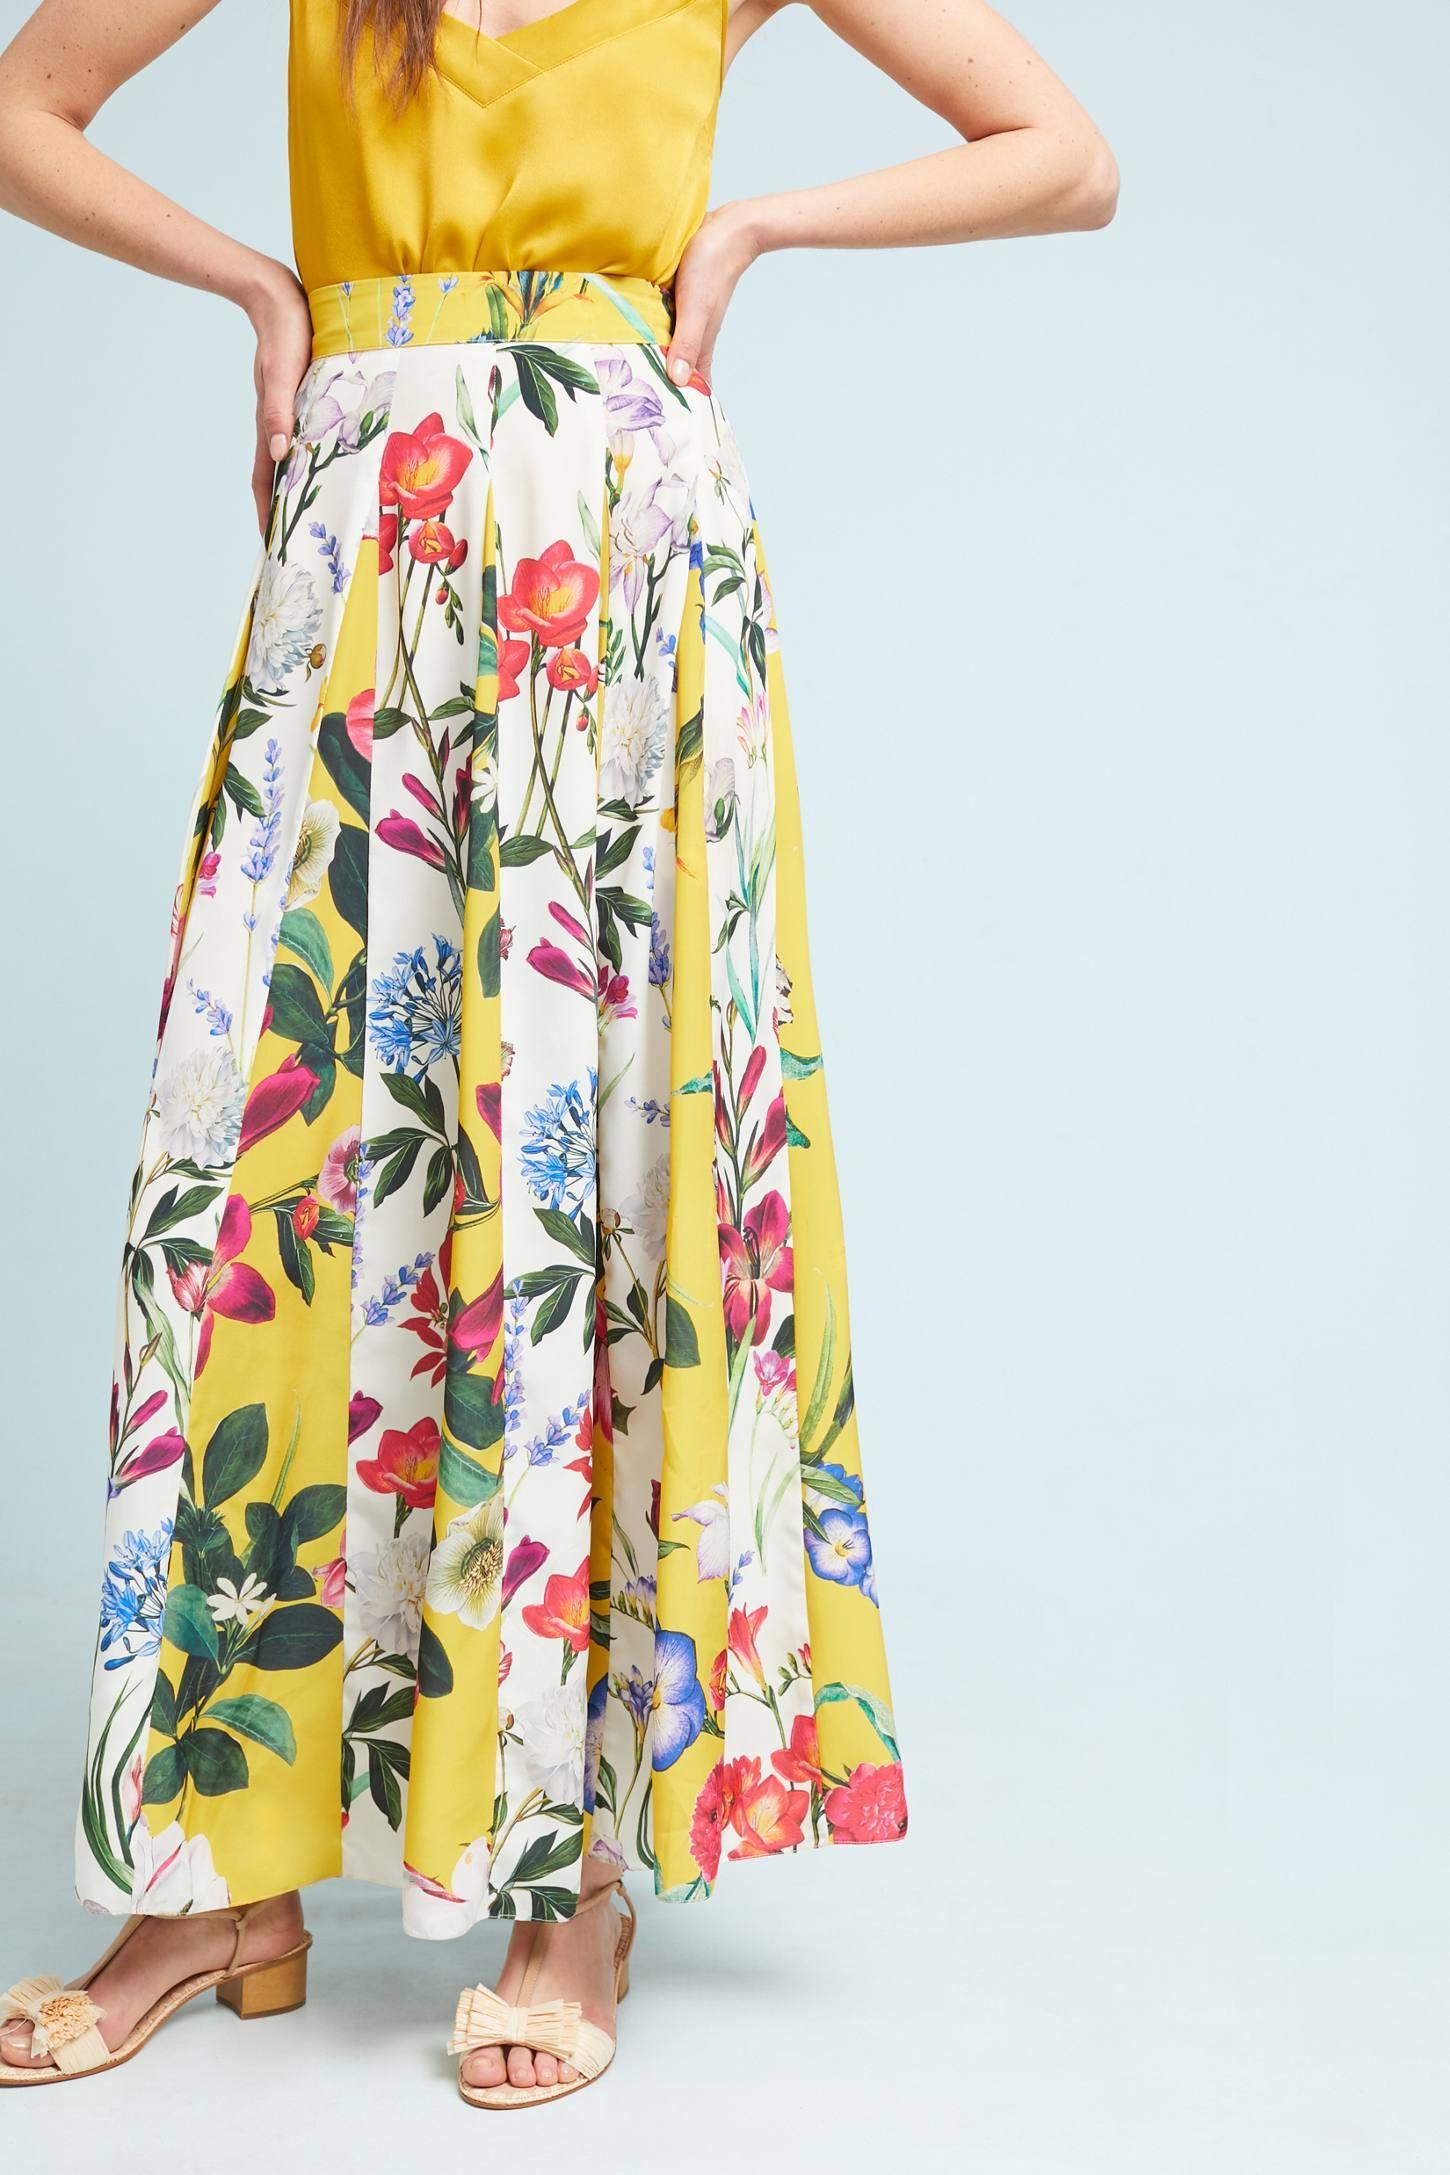 Aprile Skirt Skirts, Anthropologie, Skirt fashion